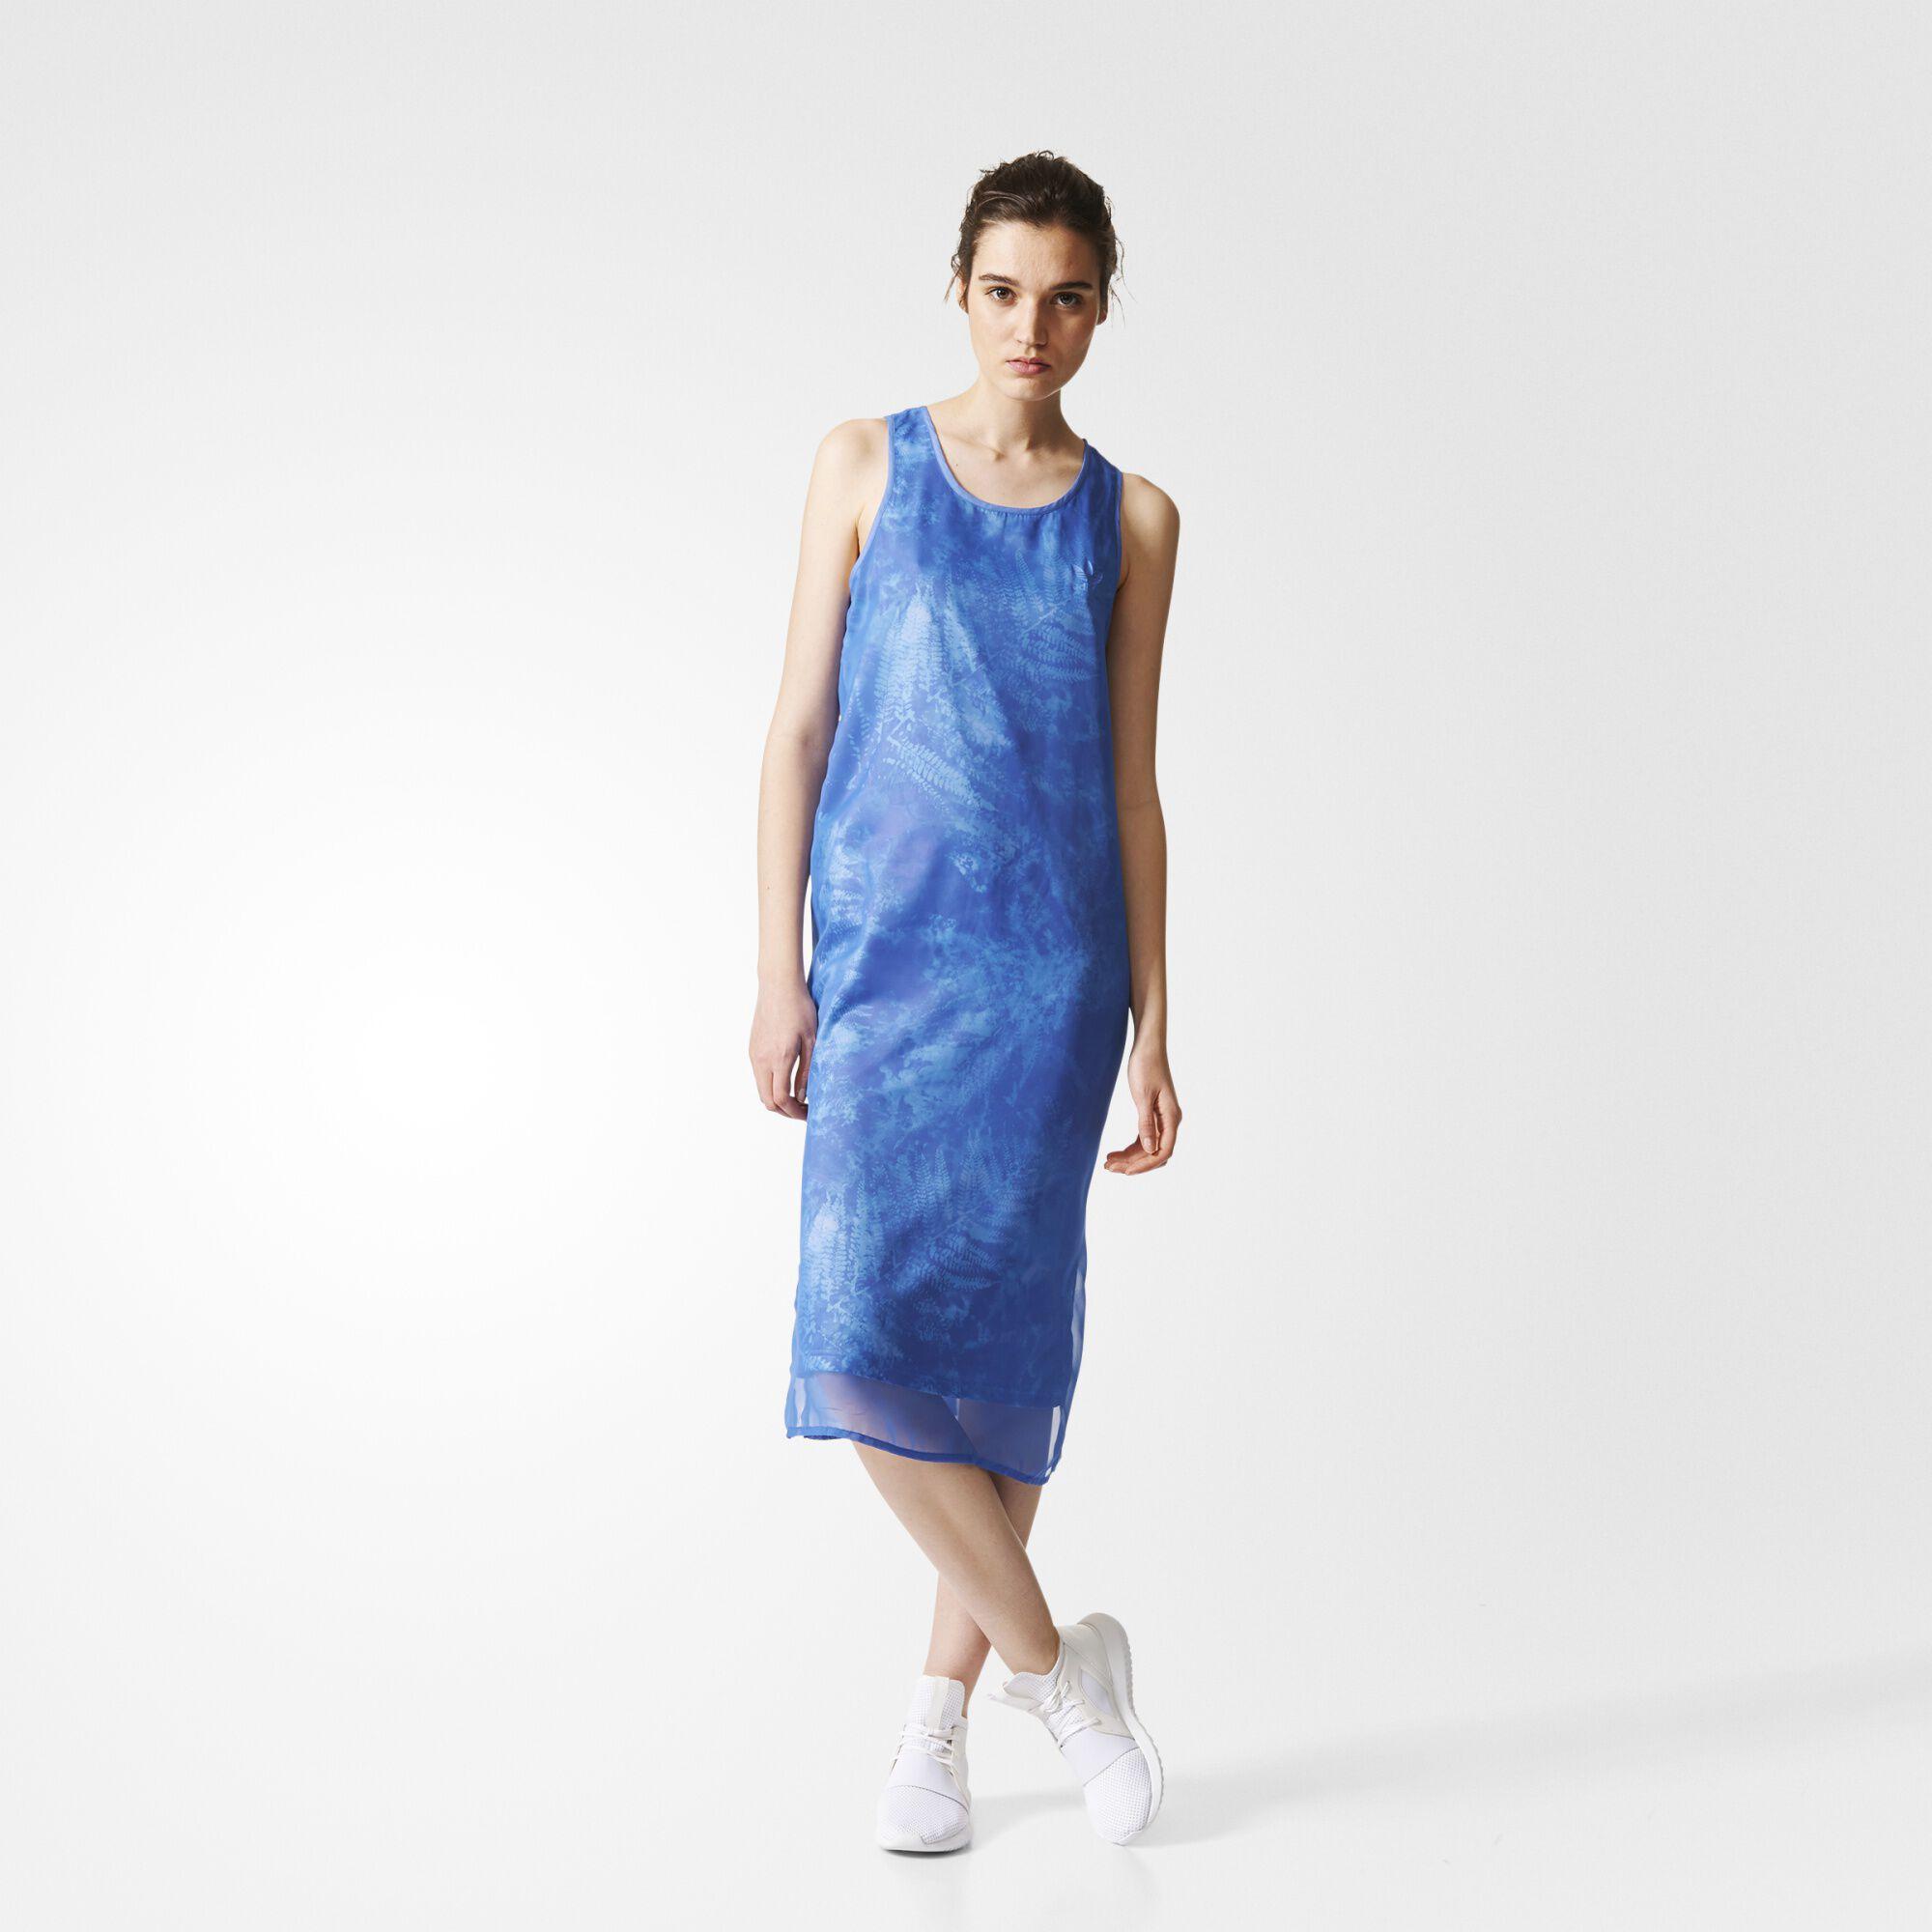 just taylor dresses